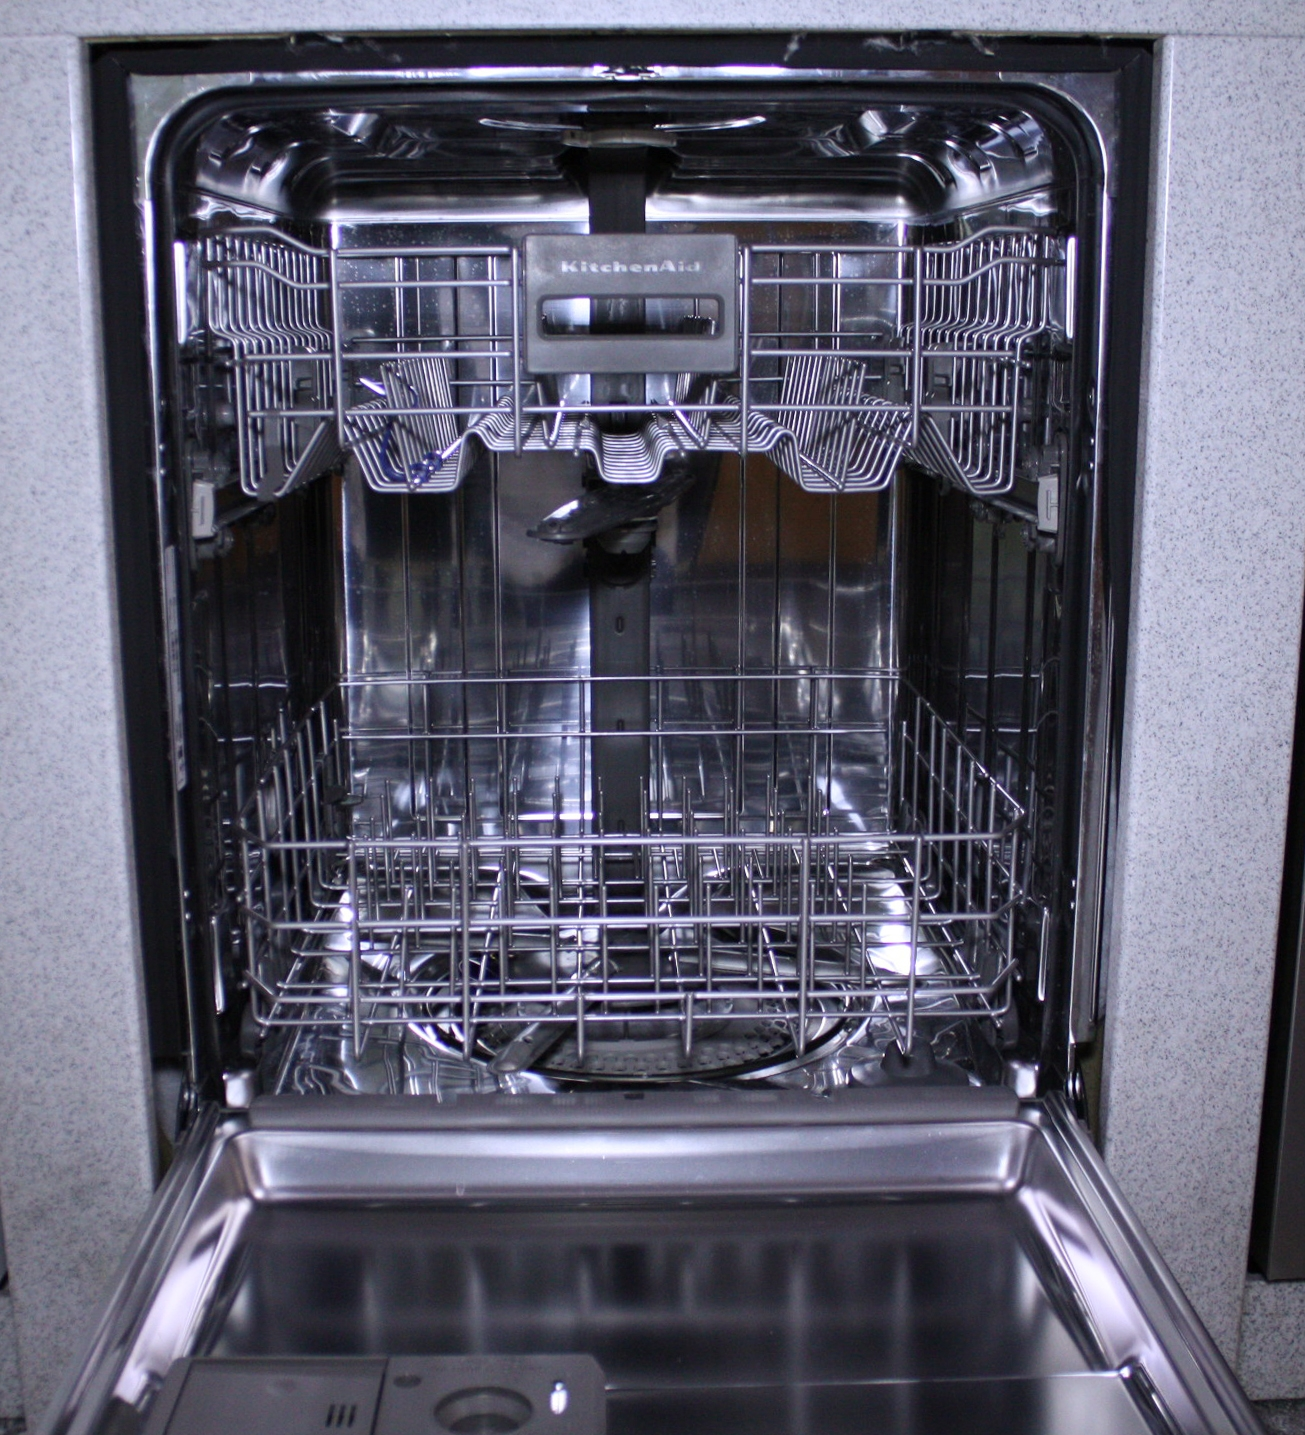 Kitchenaid Stainless Steel Dishwasher Kudc10fxss Abt